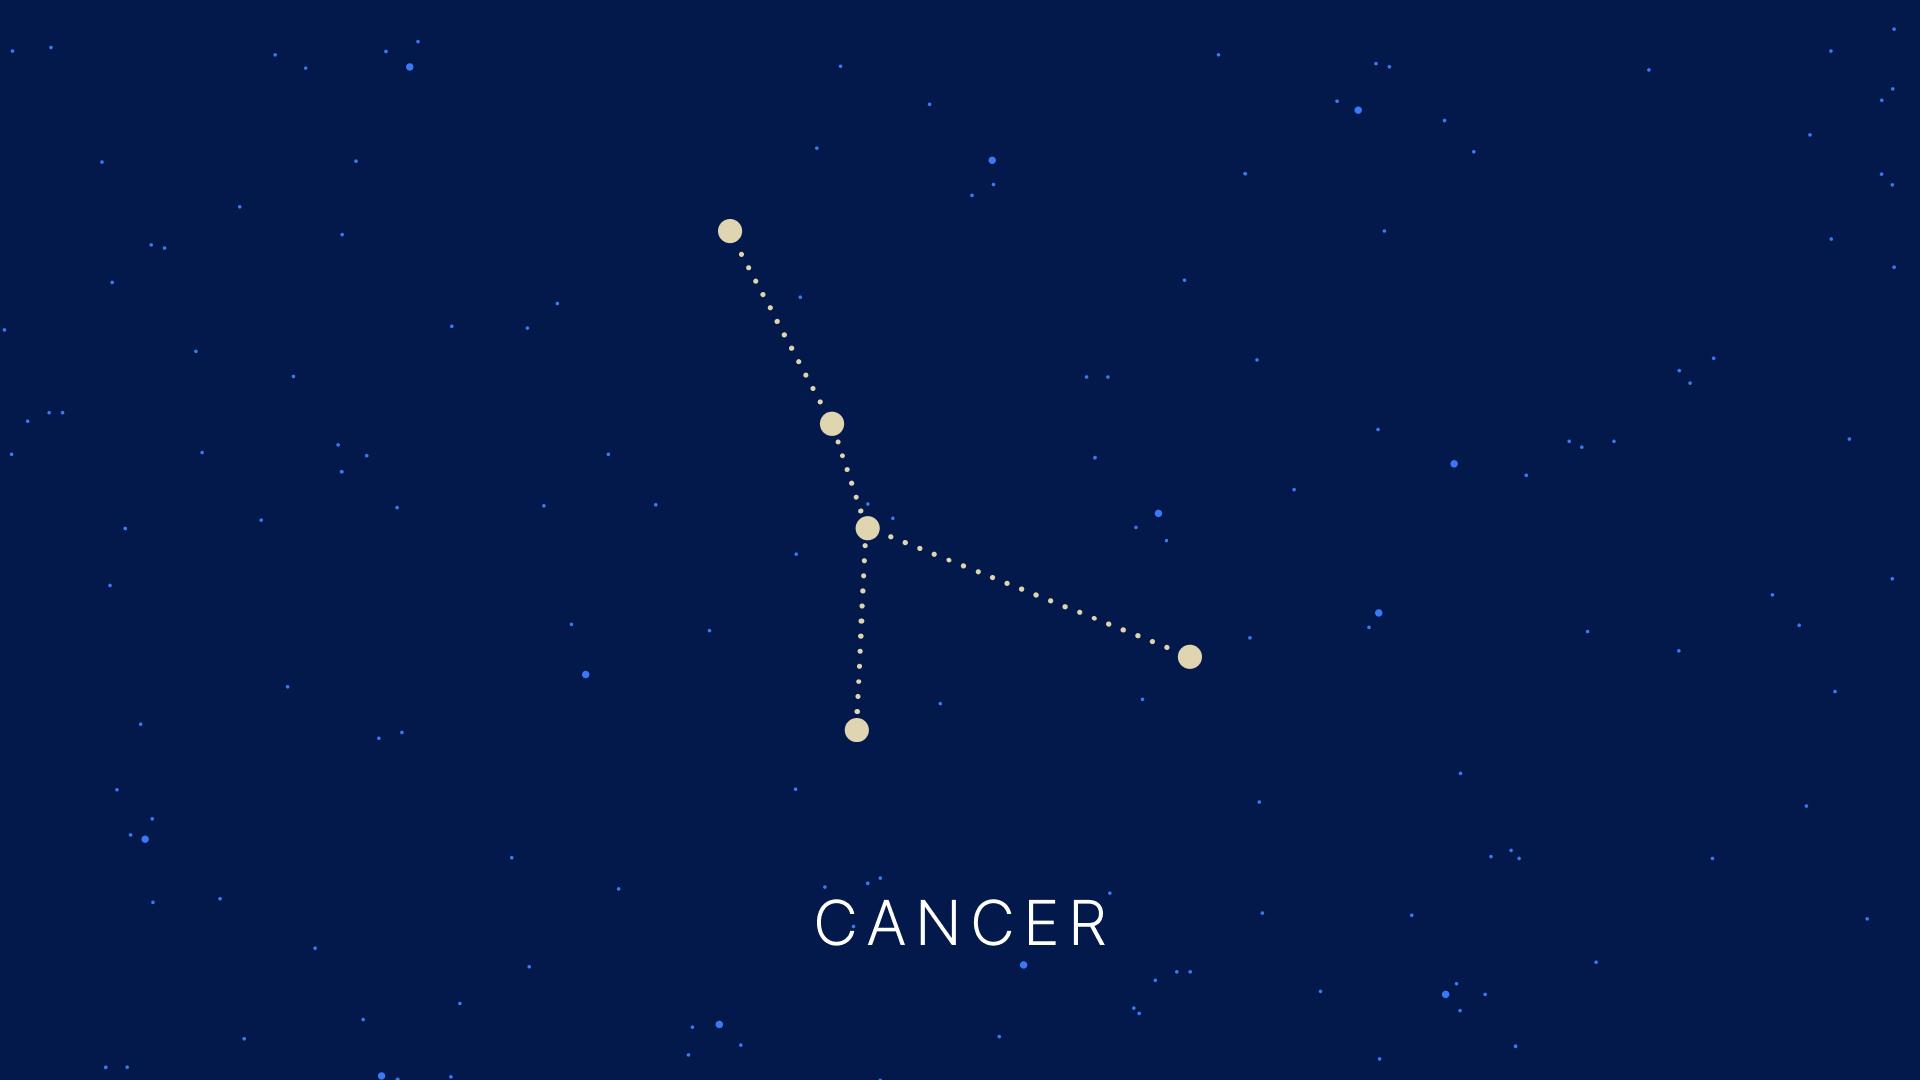 Sales Horoscope: Cancer